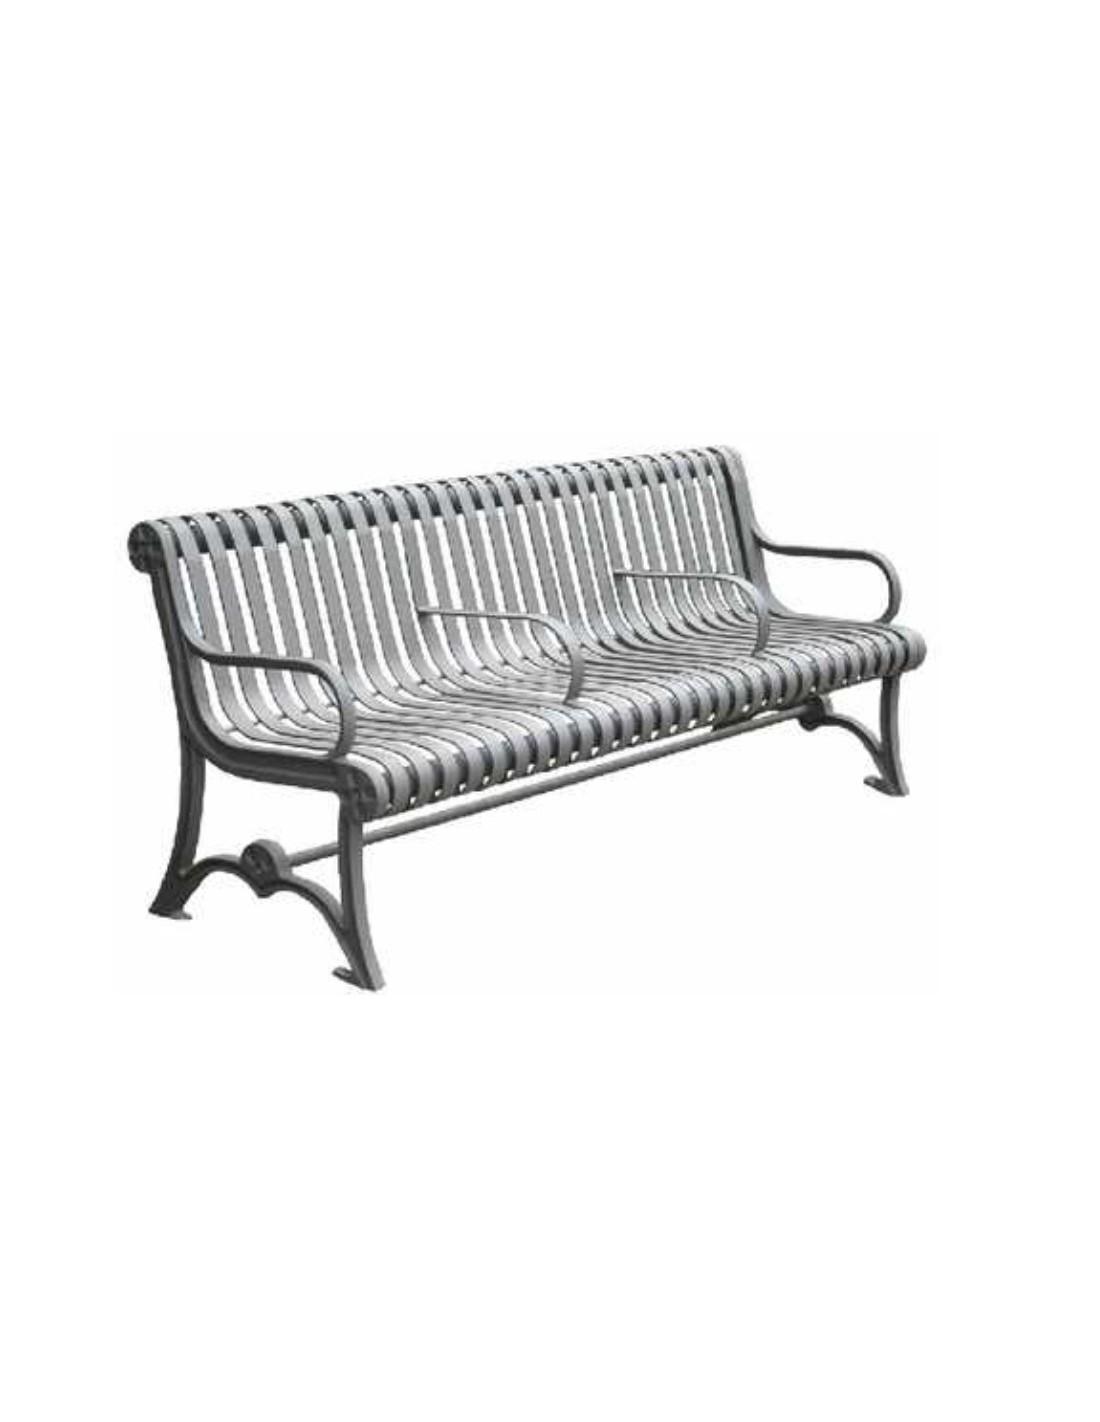 banc acier et fonte phany le mobilier urbain. Black Bedroom Furniture Sets. Home Design Ideas